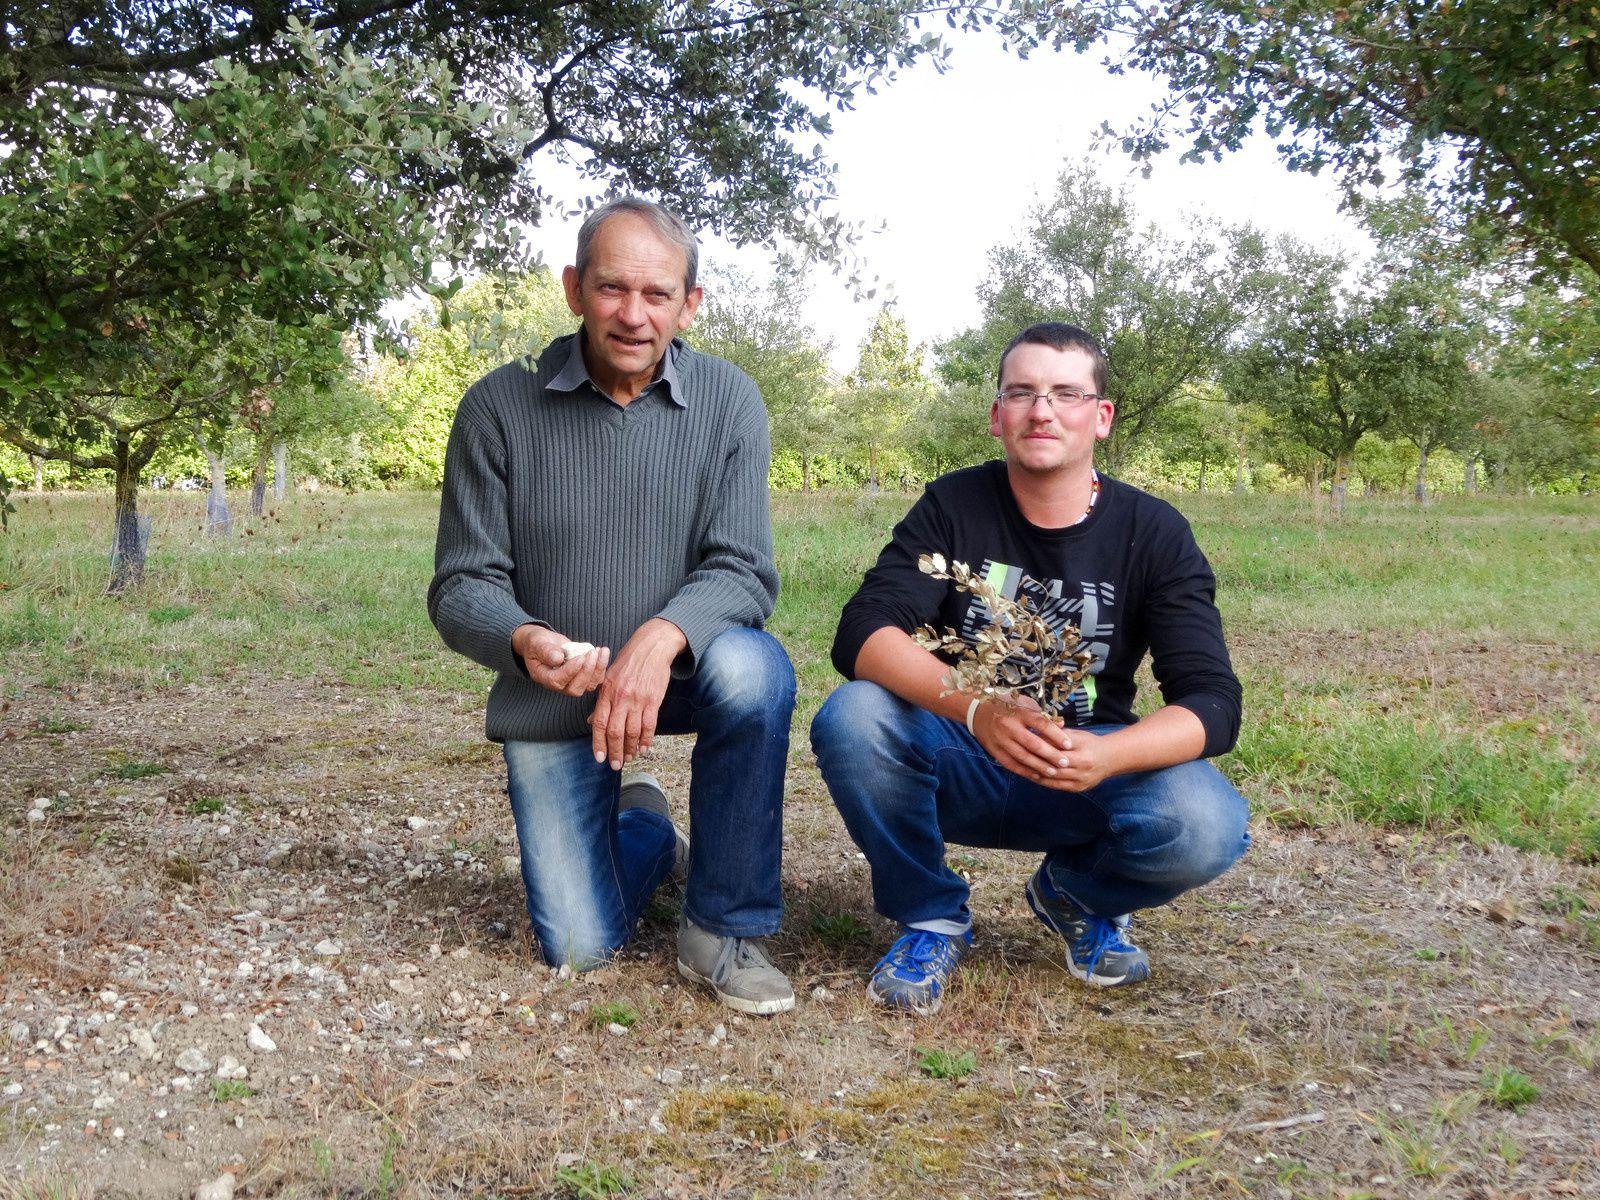 « Aqui Truf 47 » propose un crowfunding autour de la truffe